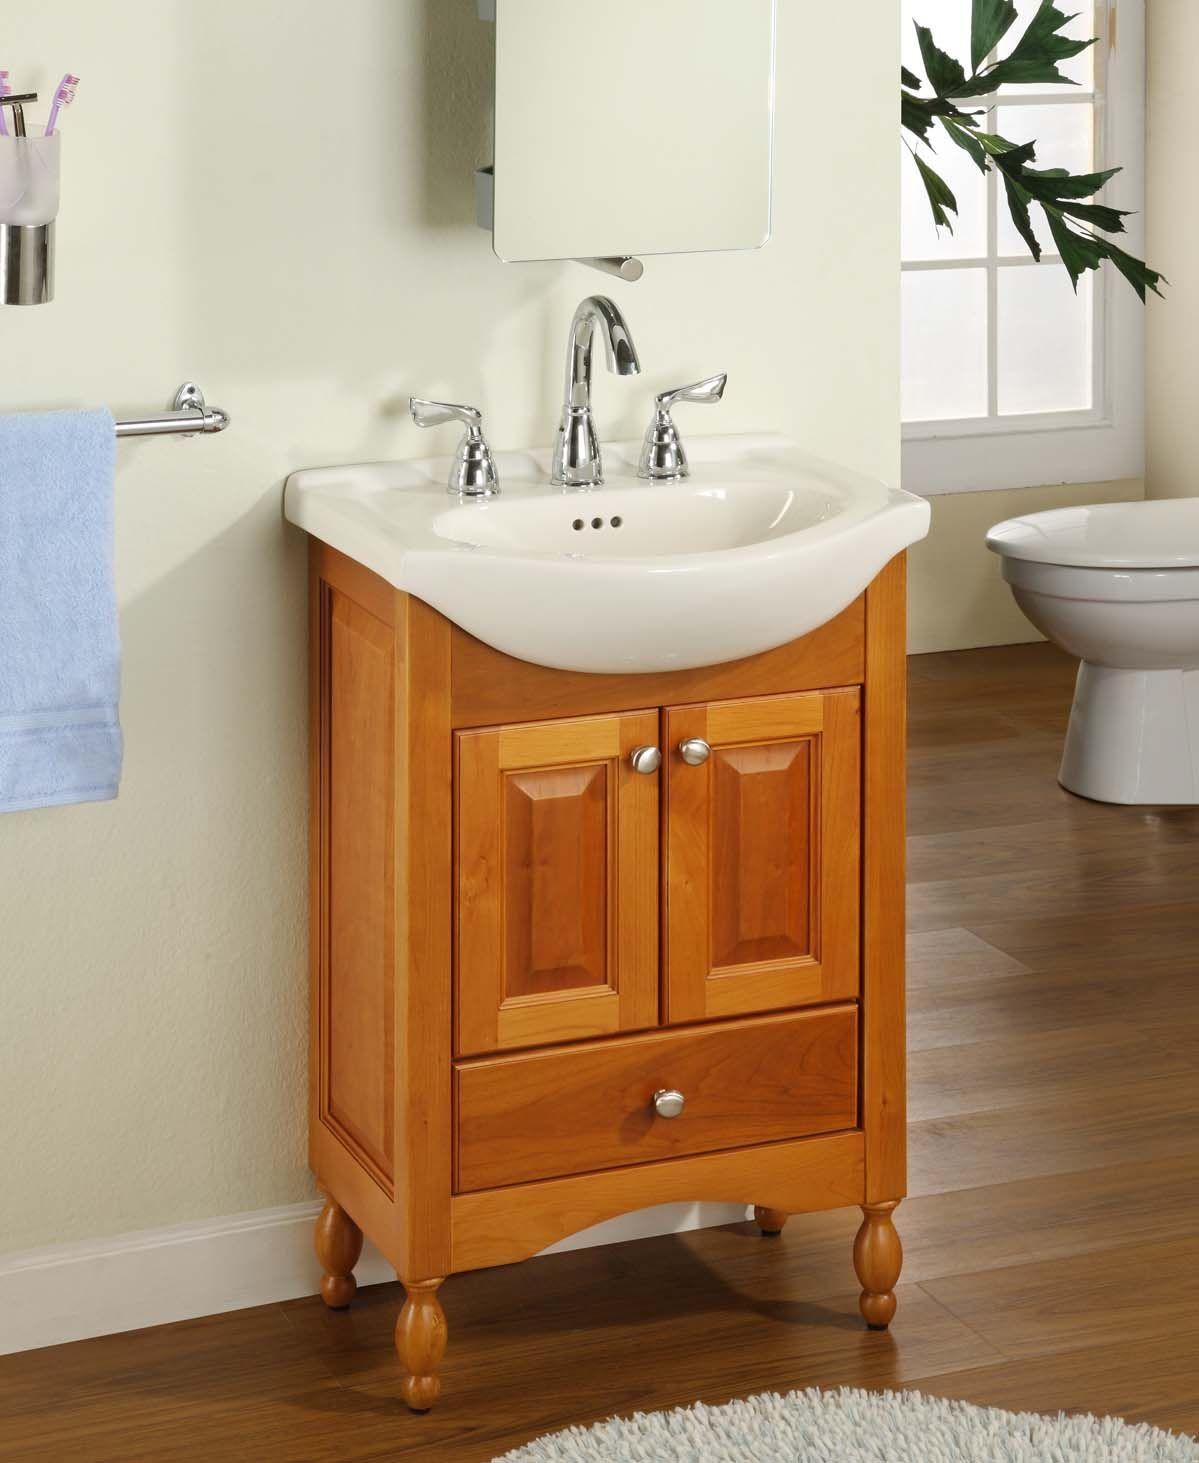 Natural Polished Maple Wood Narrow Bathroom Vanity For Ivory Soap Narrow Bathroom Vanities Narrow Bathroom Home Depot Bathroom Vanity